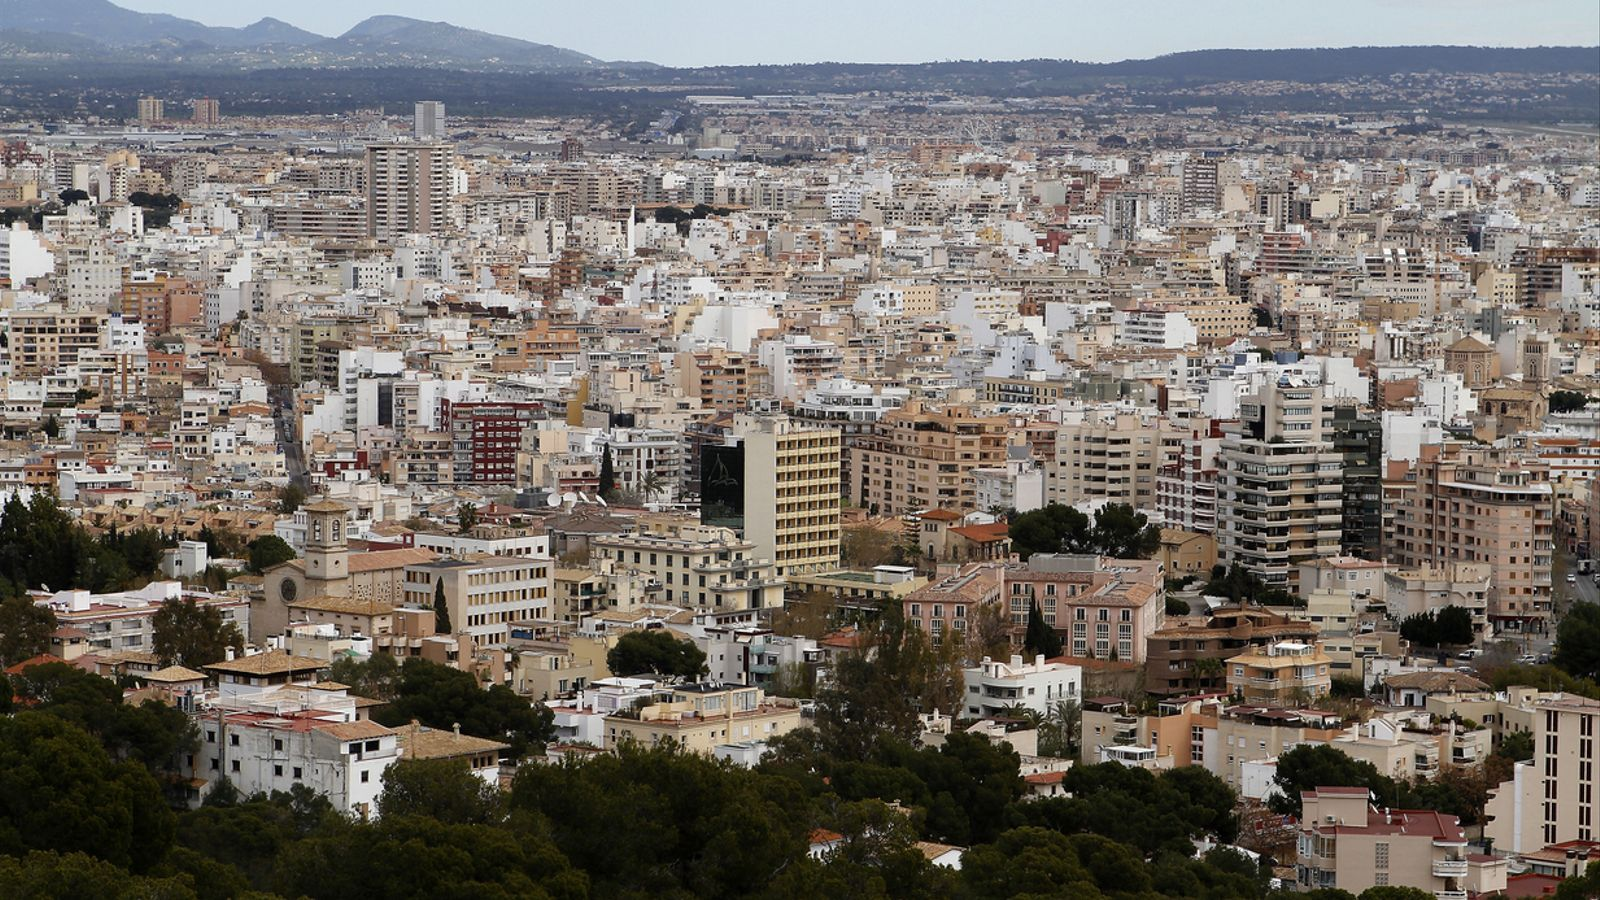 Una vista general de Palma. / ARA BALEARS